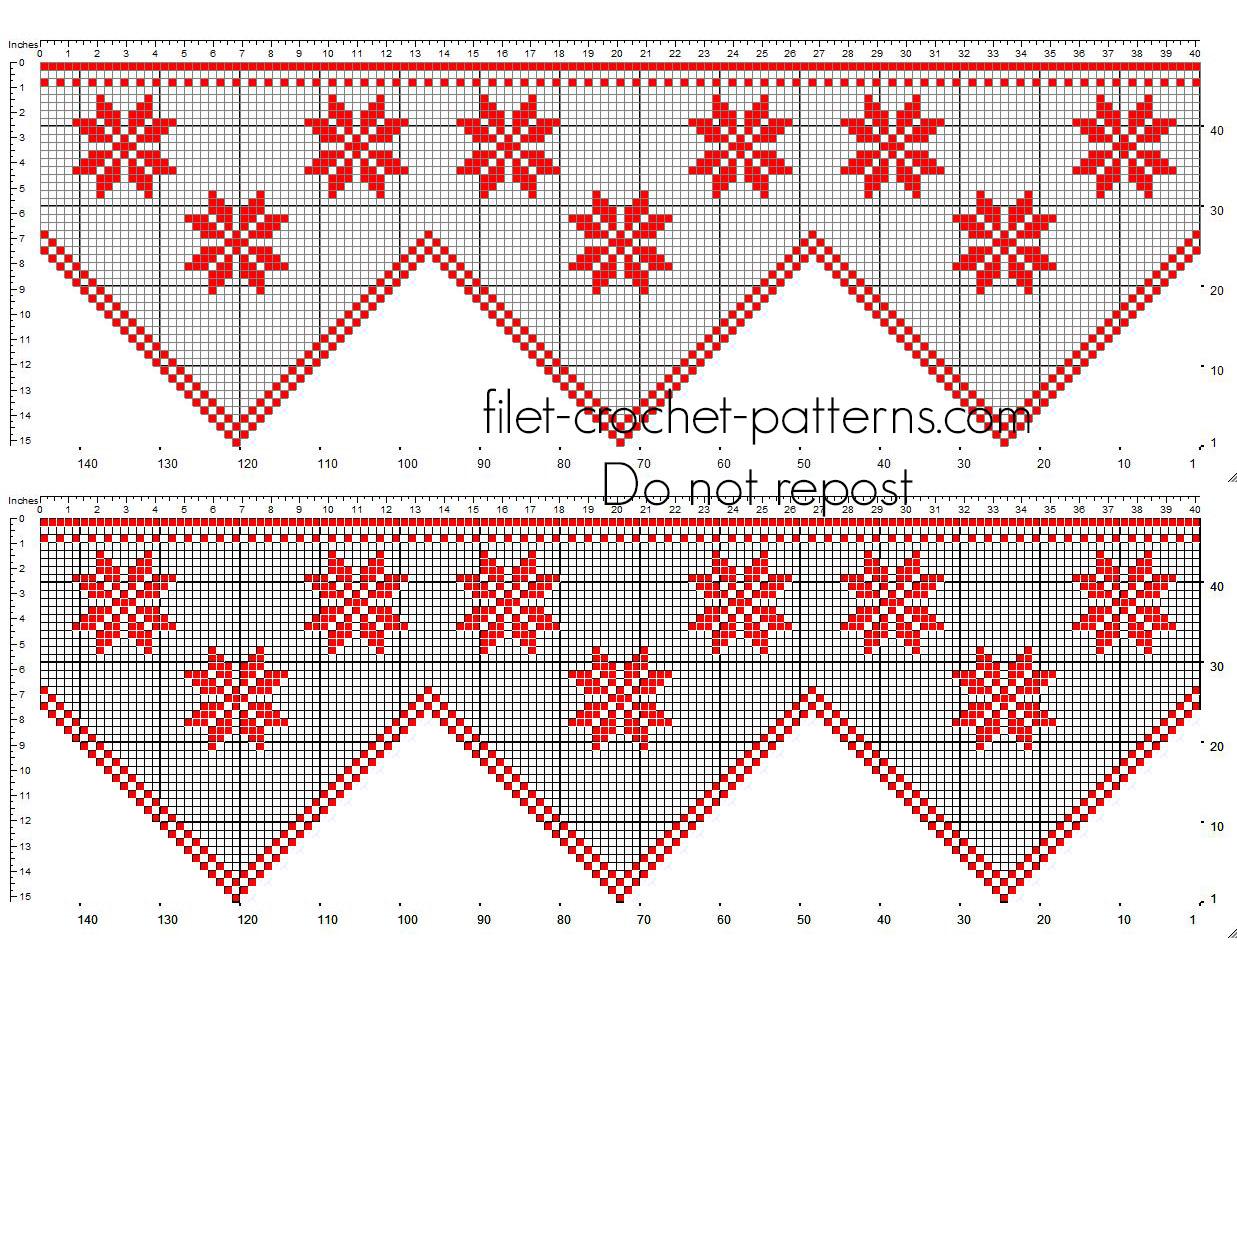 Crochet filet Christmas red border with Poinsettia Christmas Stars flowers